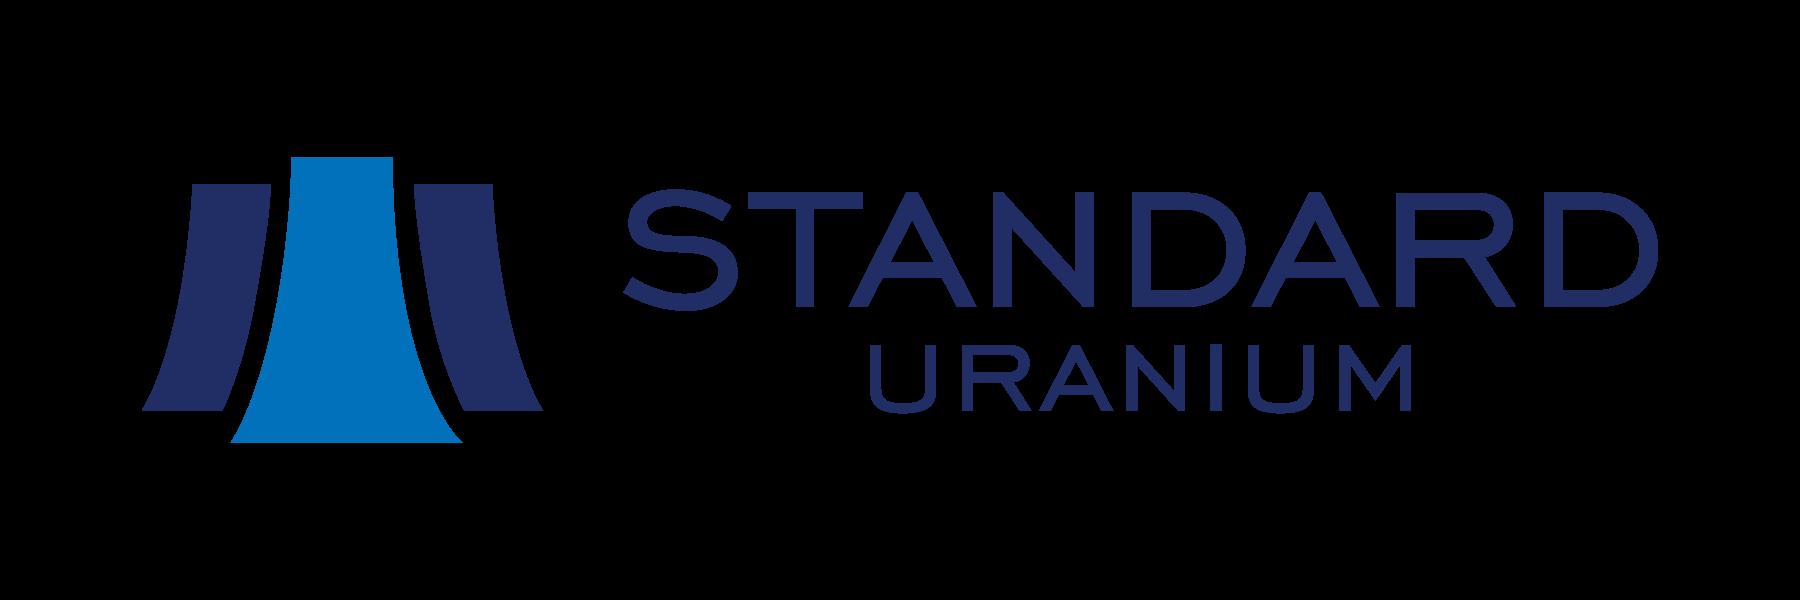 Standard Uranium Provides Progress Update at its Flagship Davidson River Project